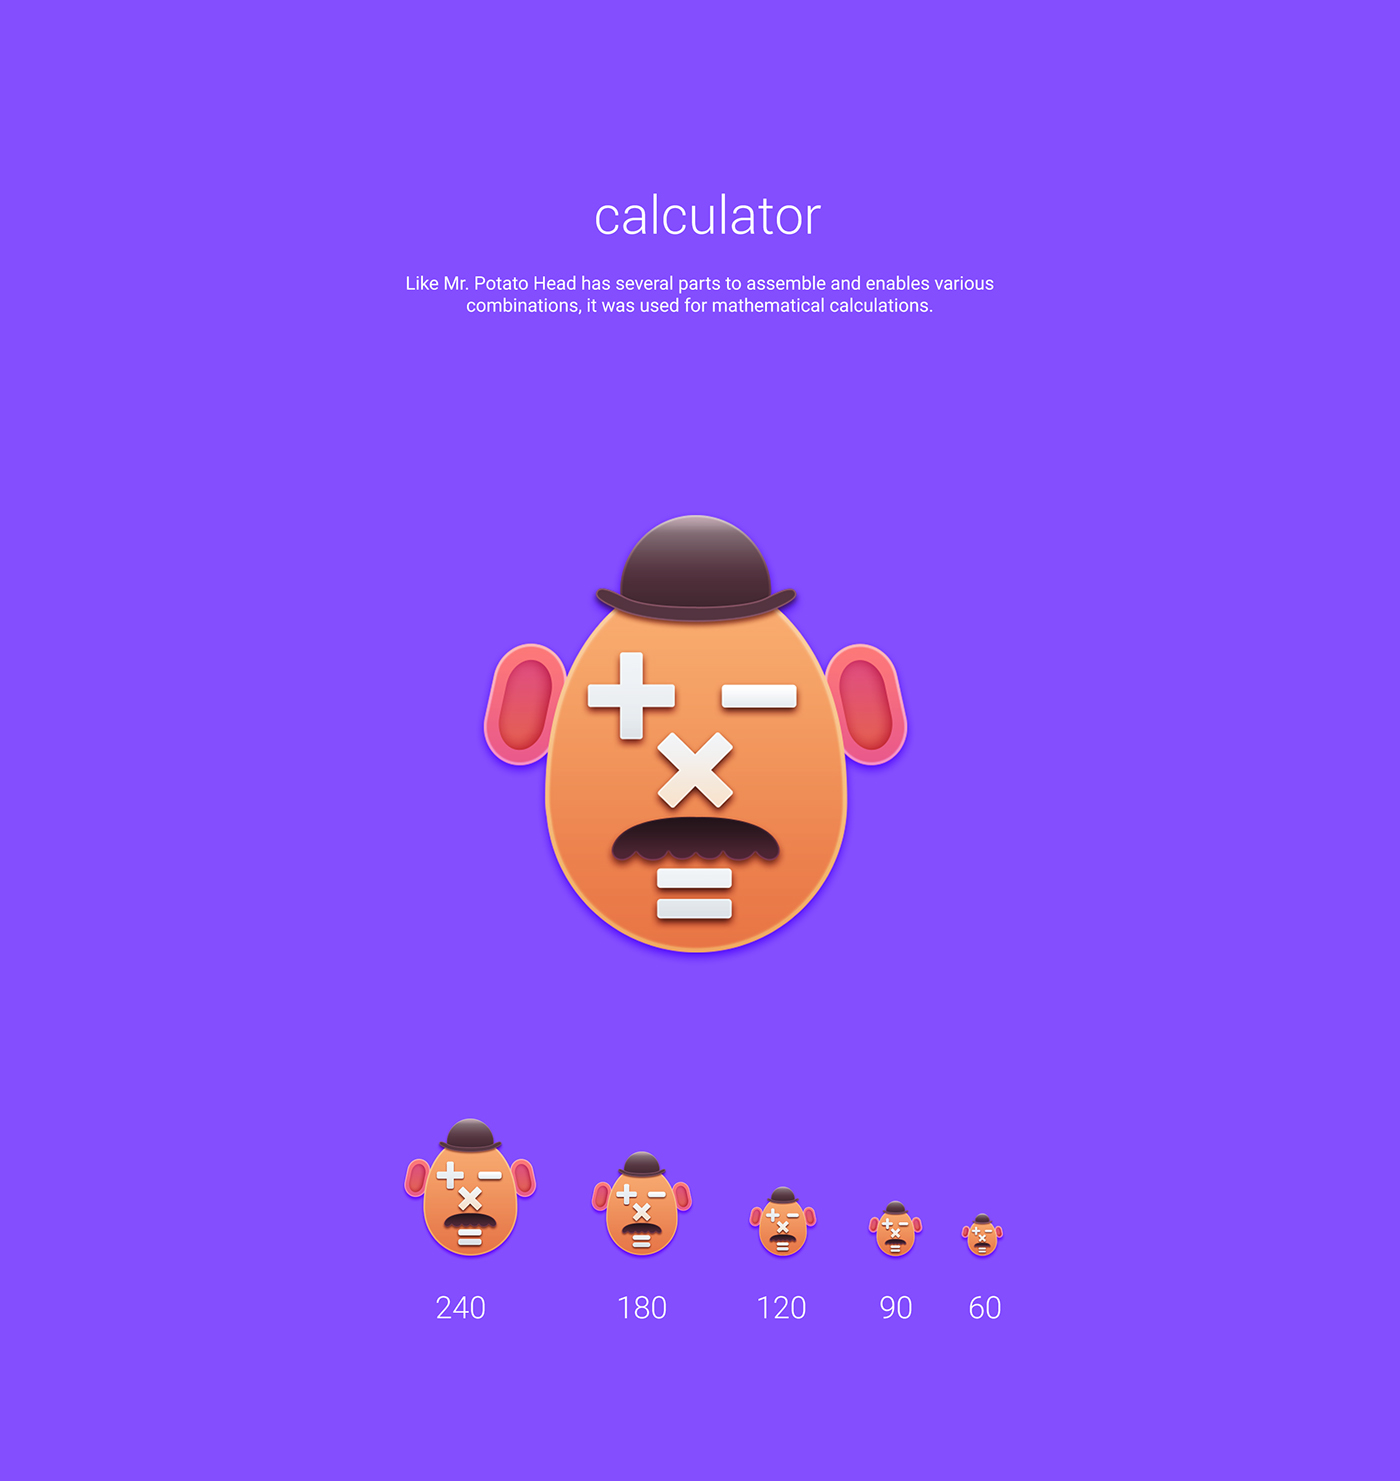 disney-pixar-toy-story-android-icons-leo-natsume-14